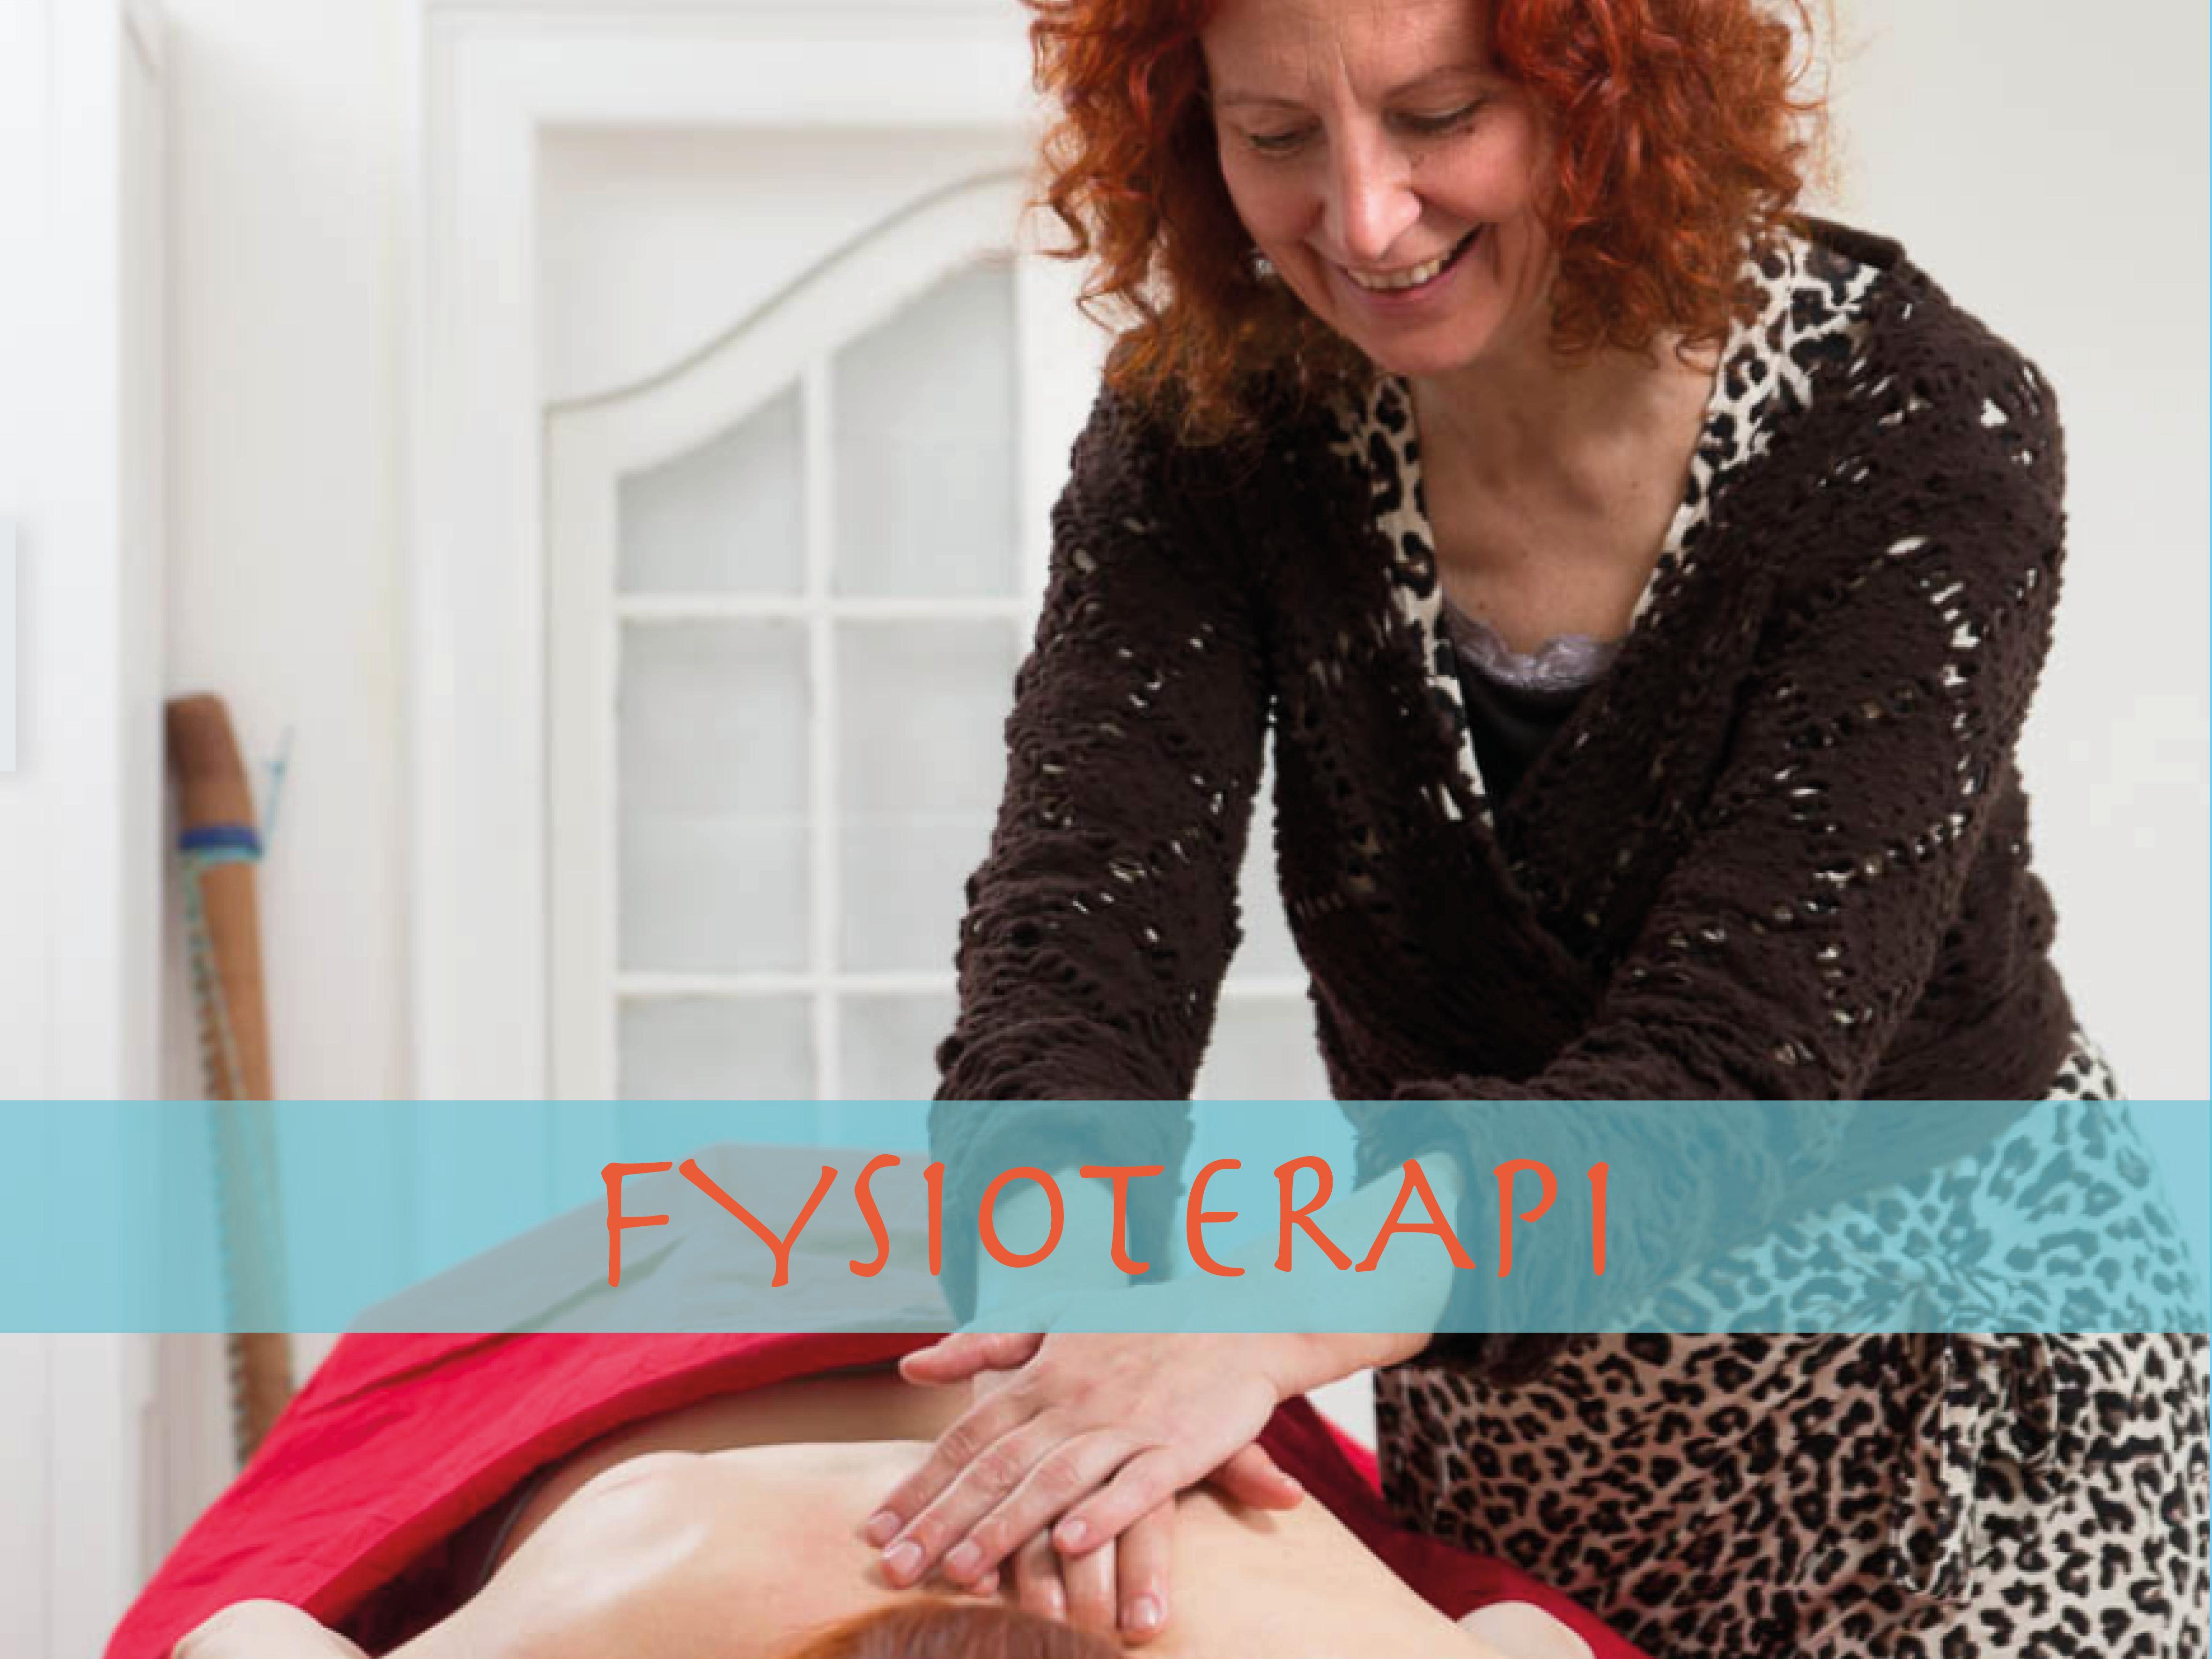 FYSIOTERAPI - Find Din Vej - Ritte Hagens - Fysioterapeut